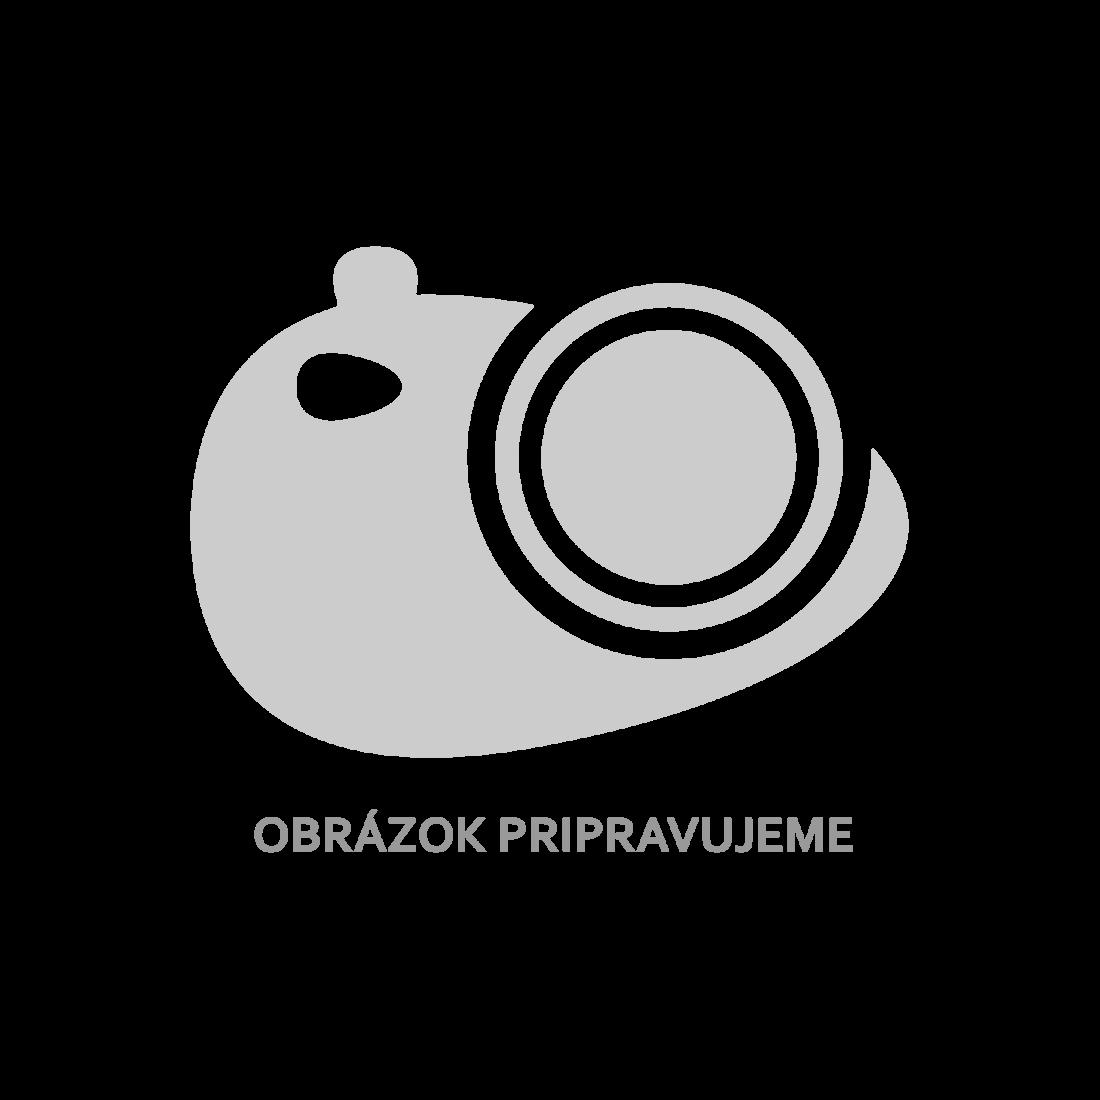 vidaXL Jídelní stůl bílý a dub sonoma 180 x 90 x 76 cm dřevotříska [801306]